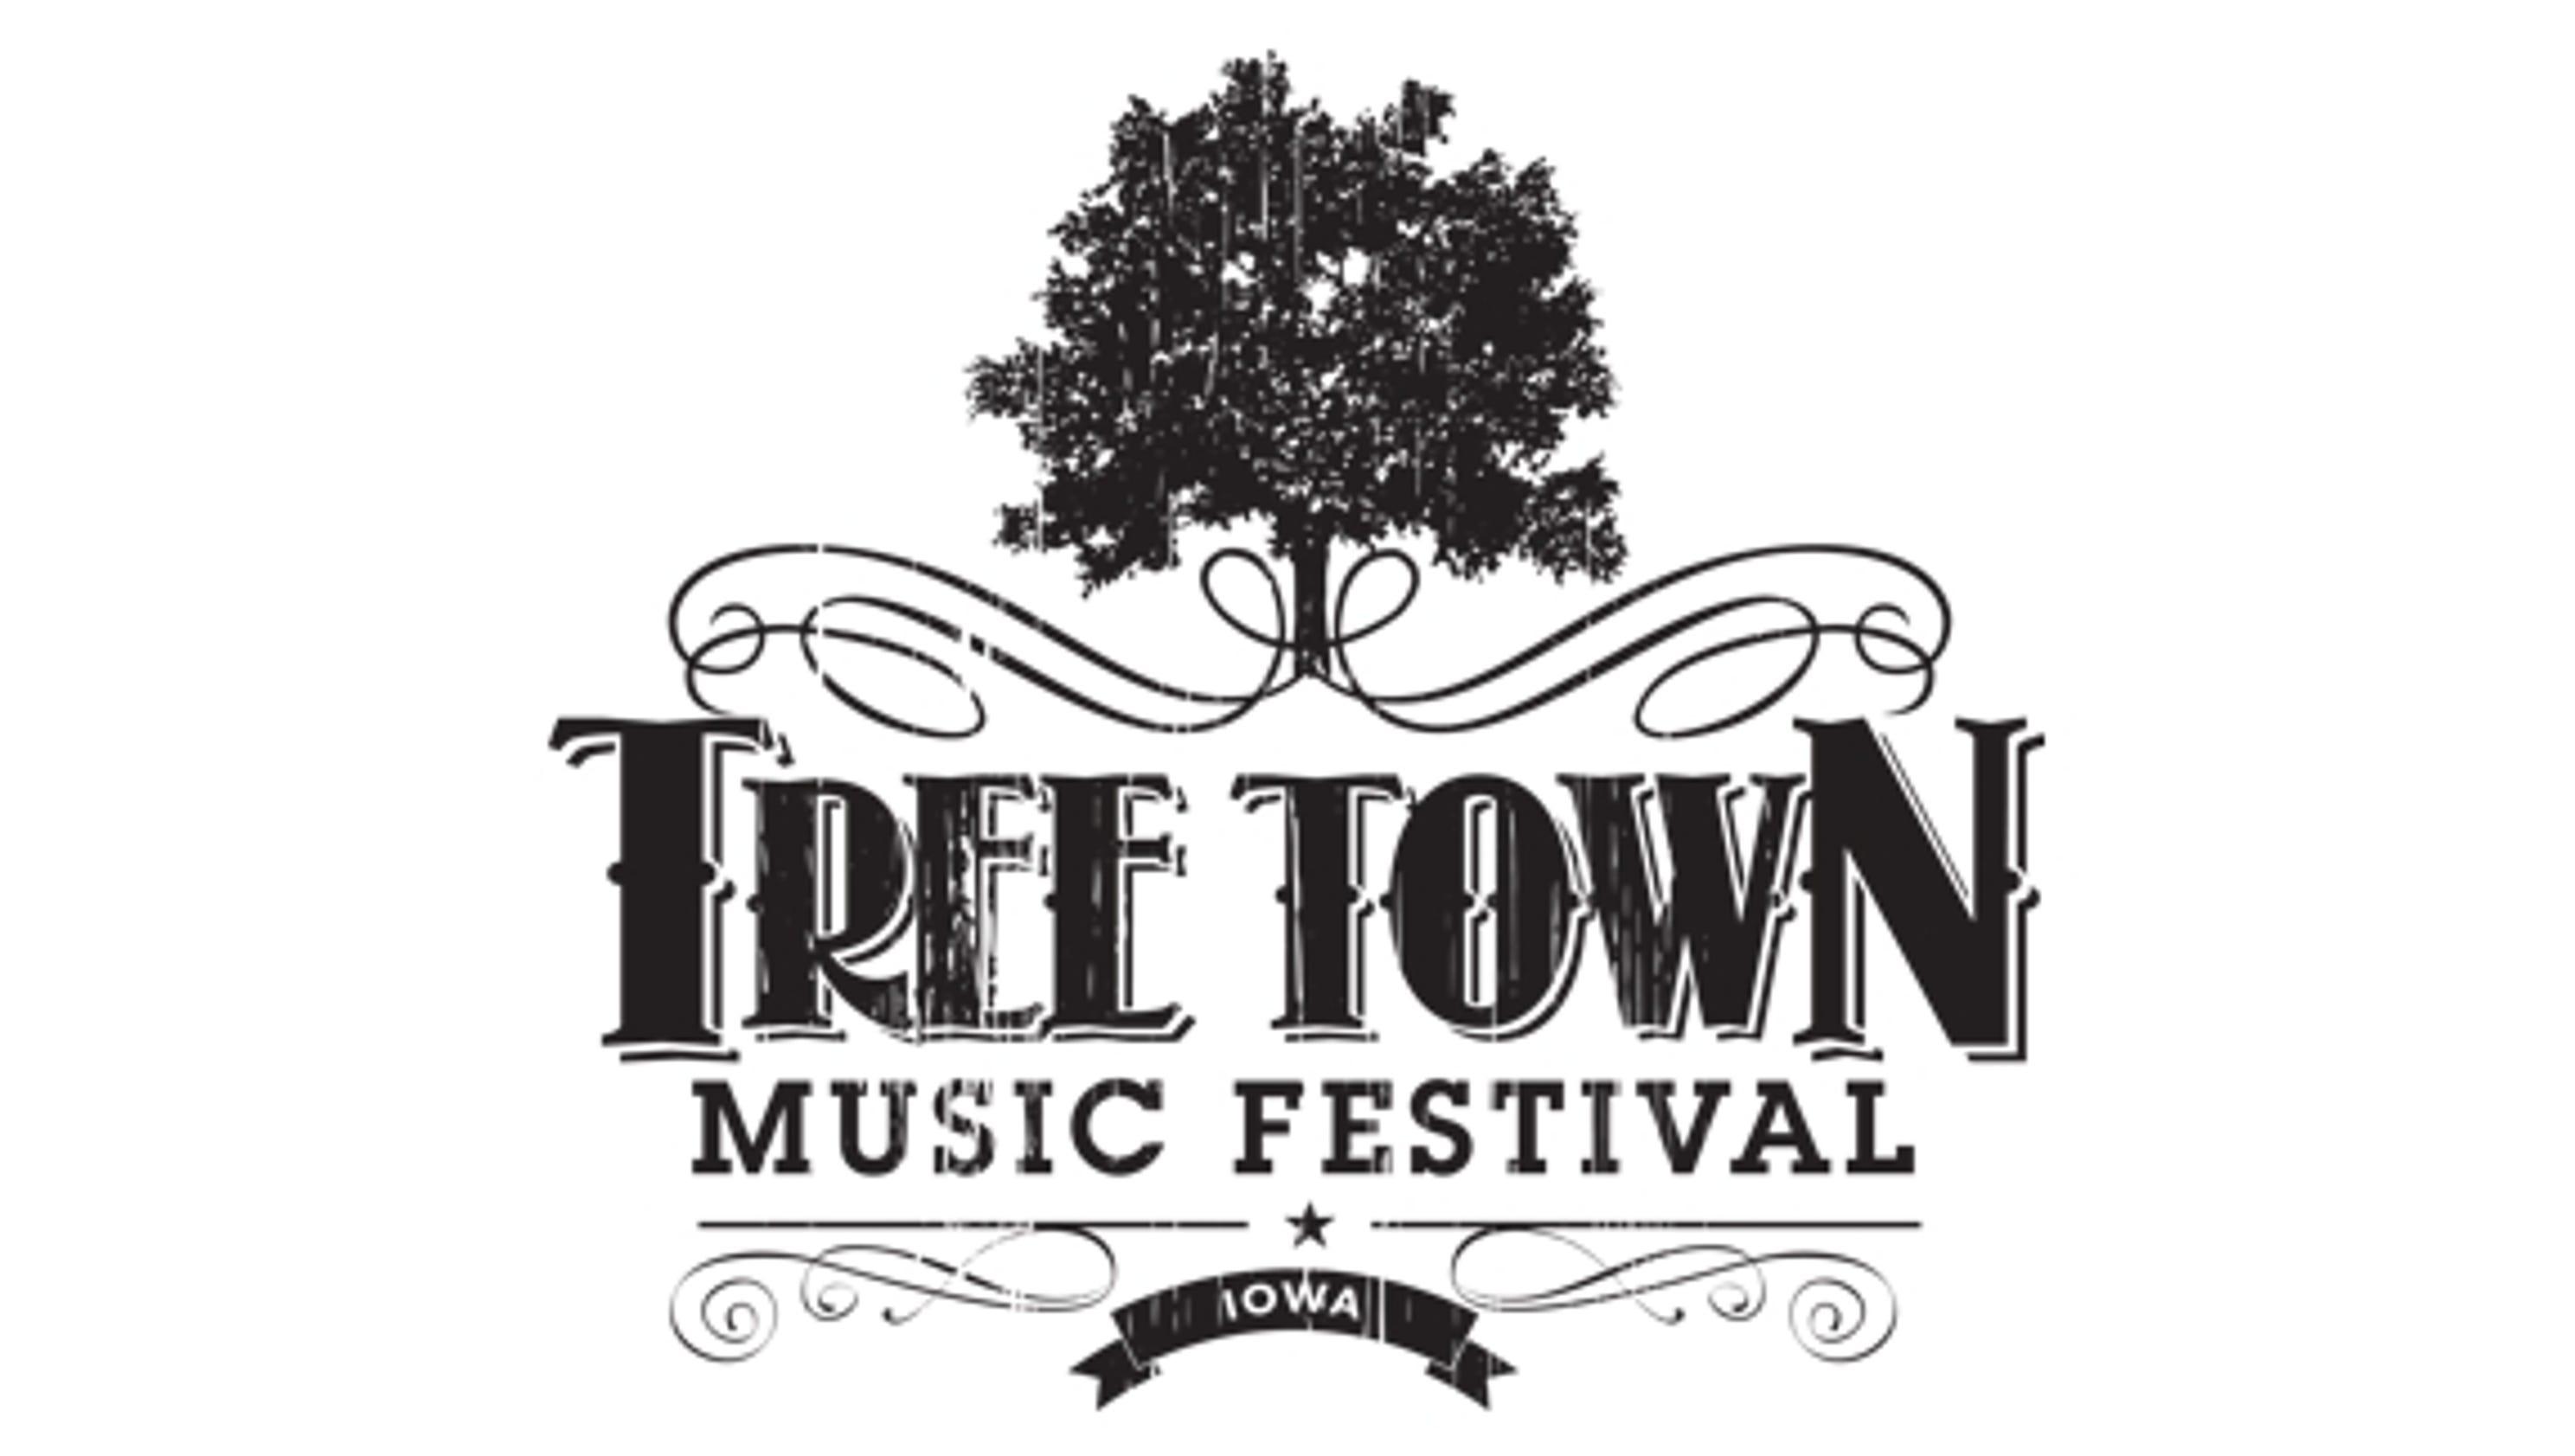 Treetown Music Festival 2020 Tree town music festival 2019 lineup